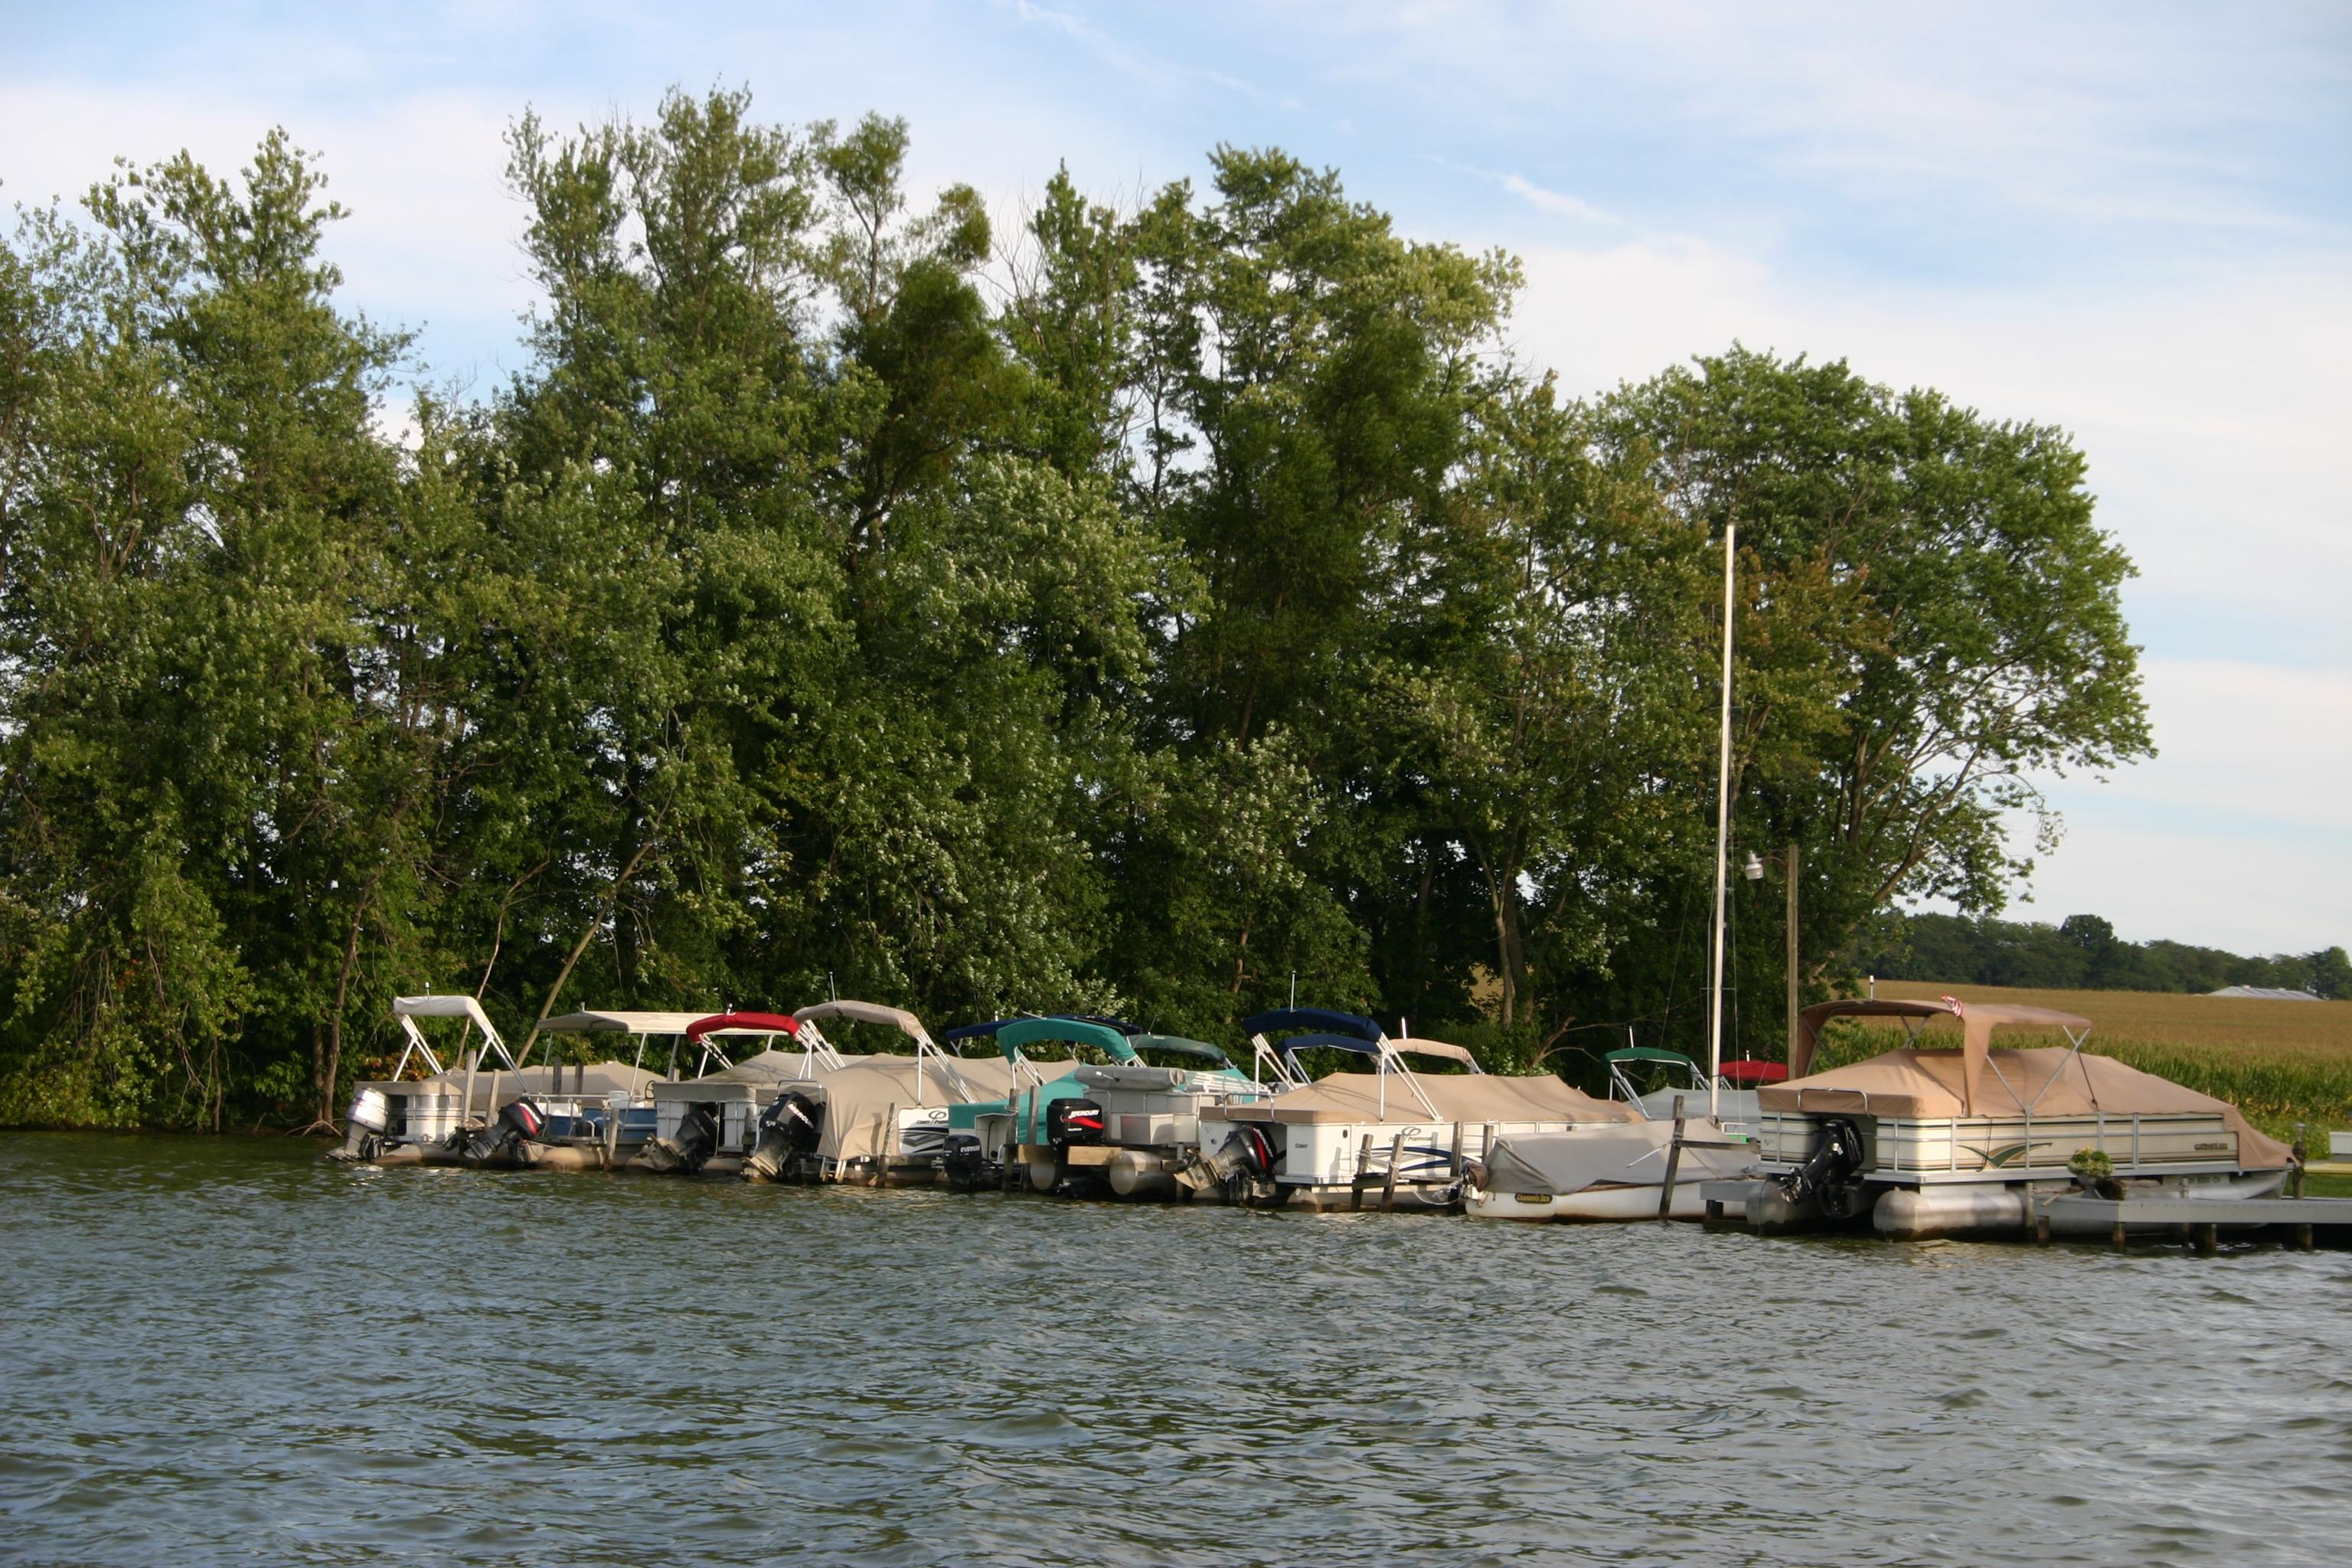 Ohio State Park Boat Rental List